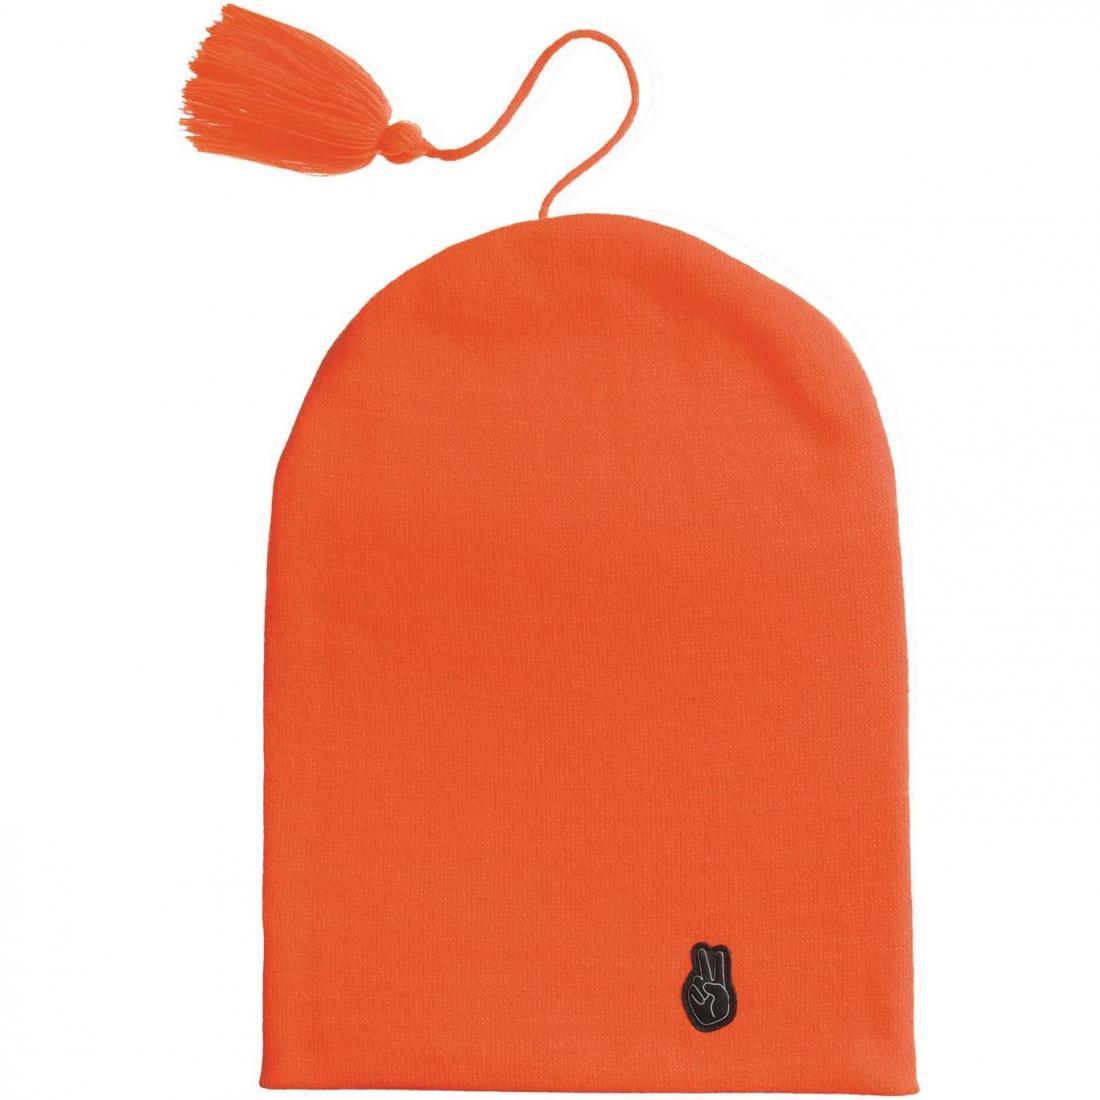 Шапка NisseШапки<br>Состав: 100% Акрил<br><br>Цвет: Оранжевый<br>Размер: None